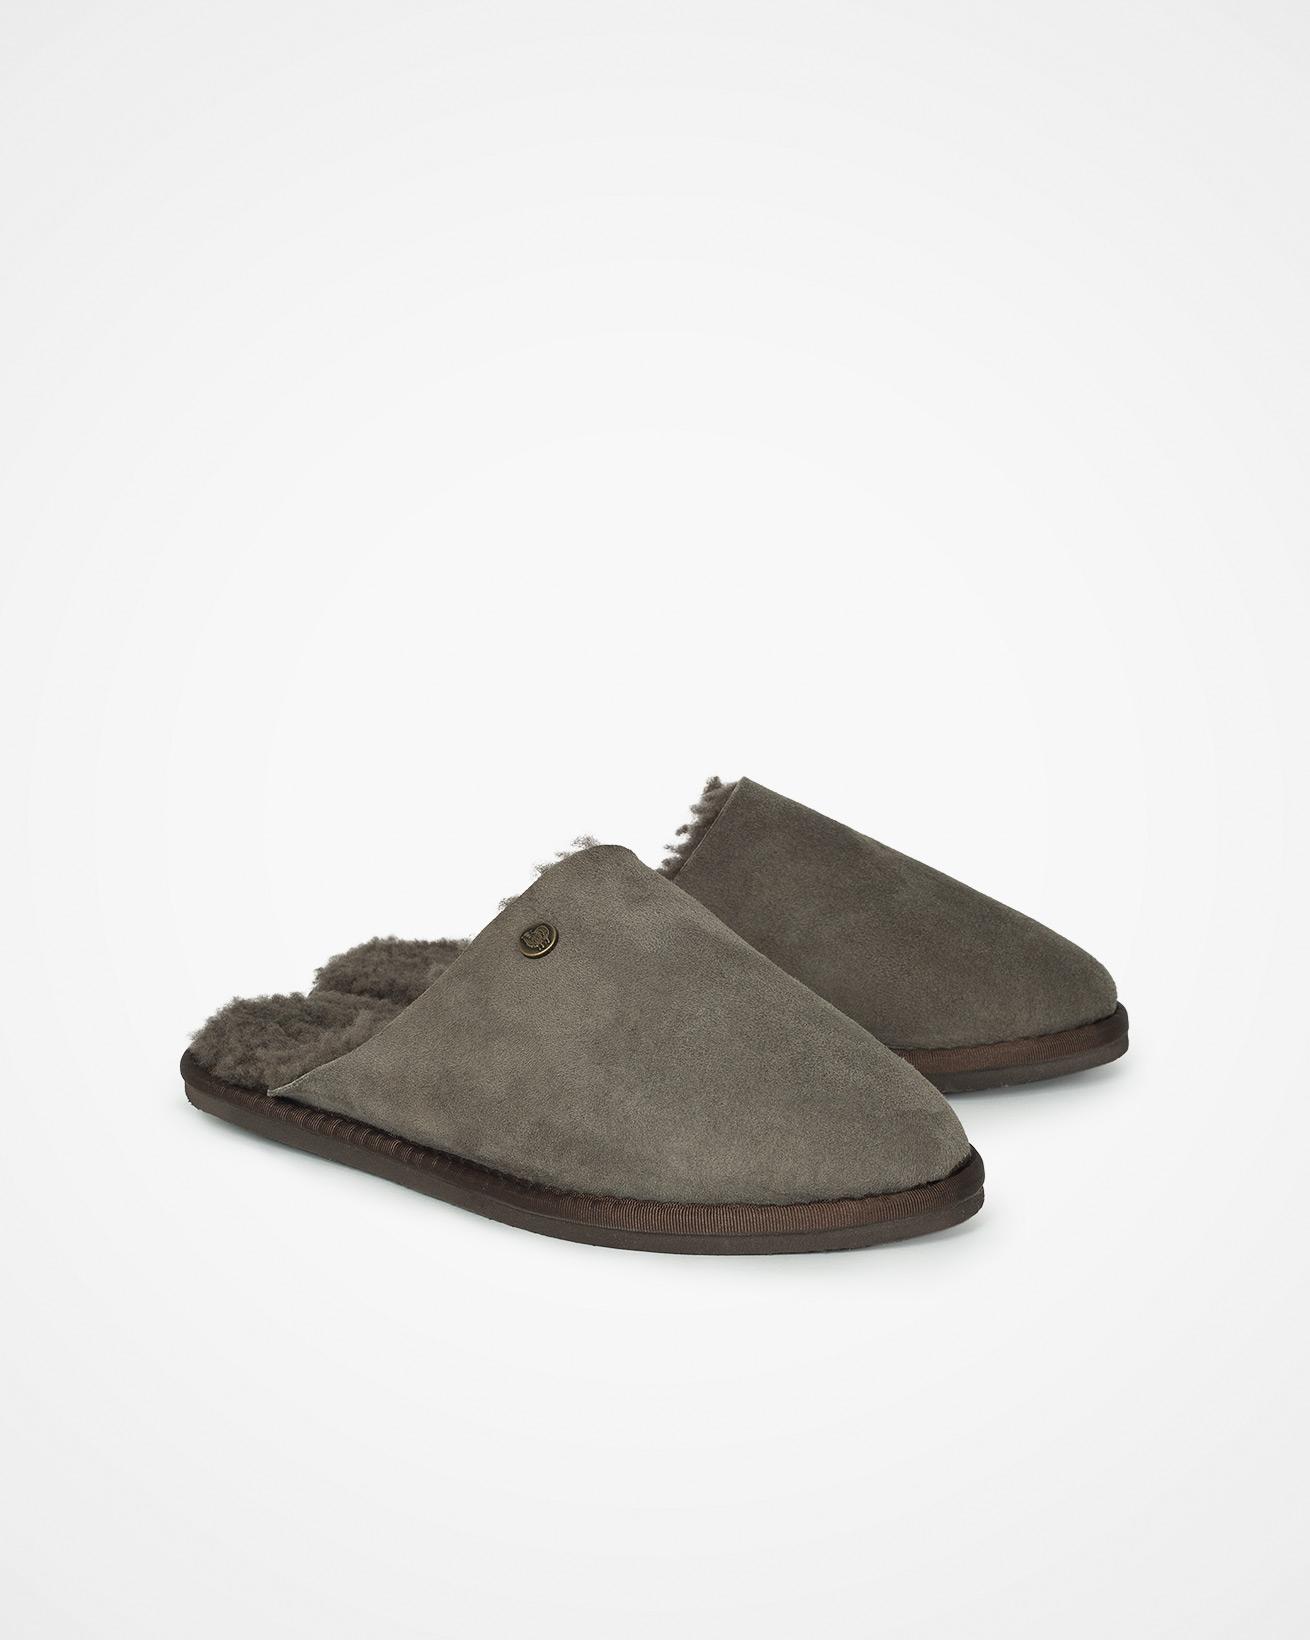 6615_maybe_mule-slipper_vole_pair.jpg